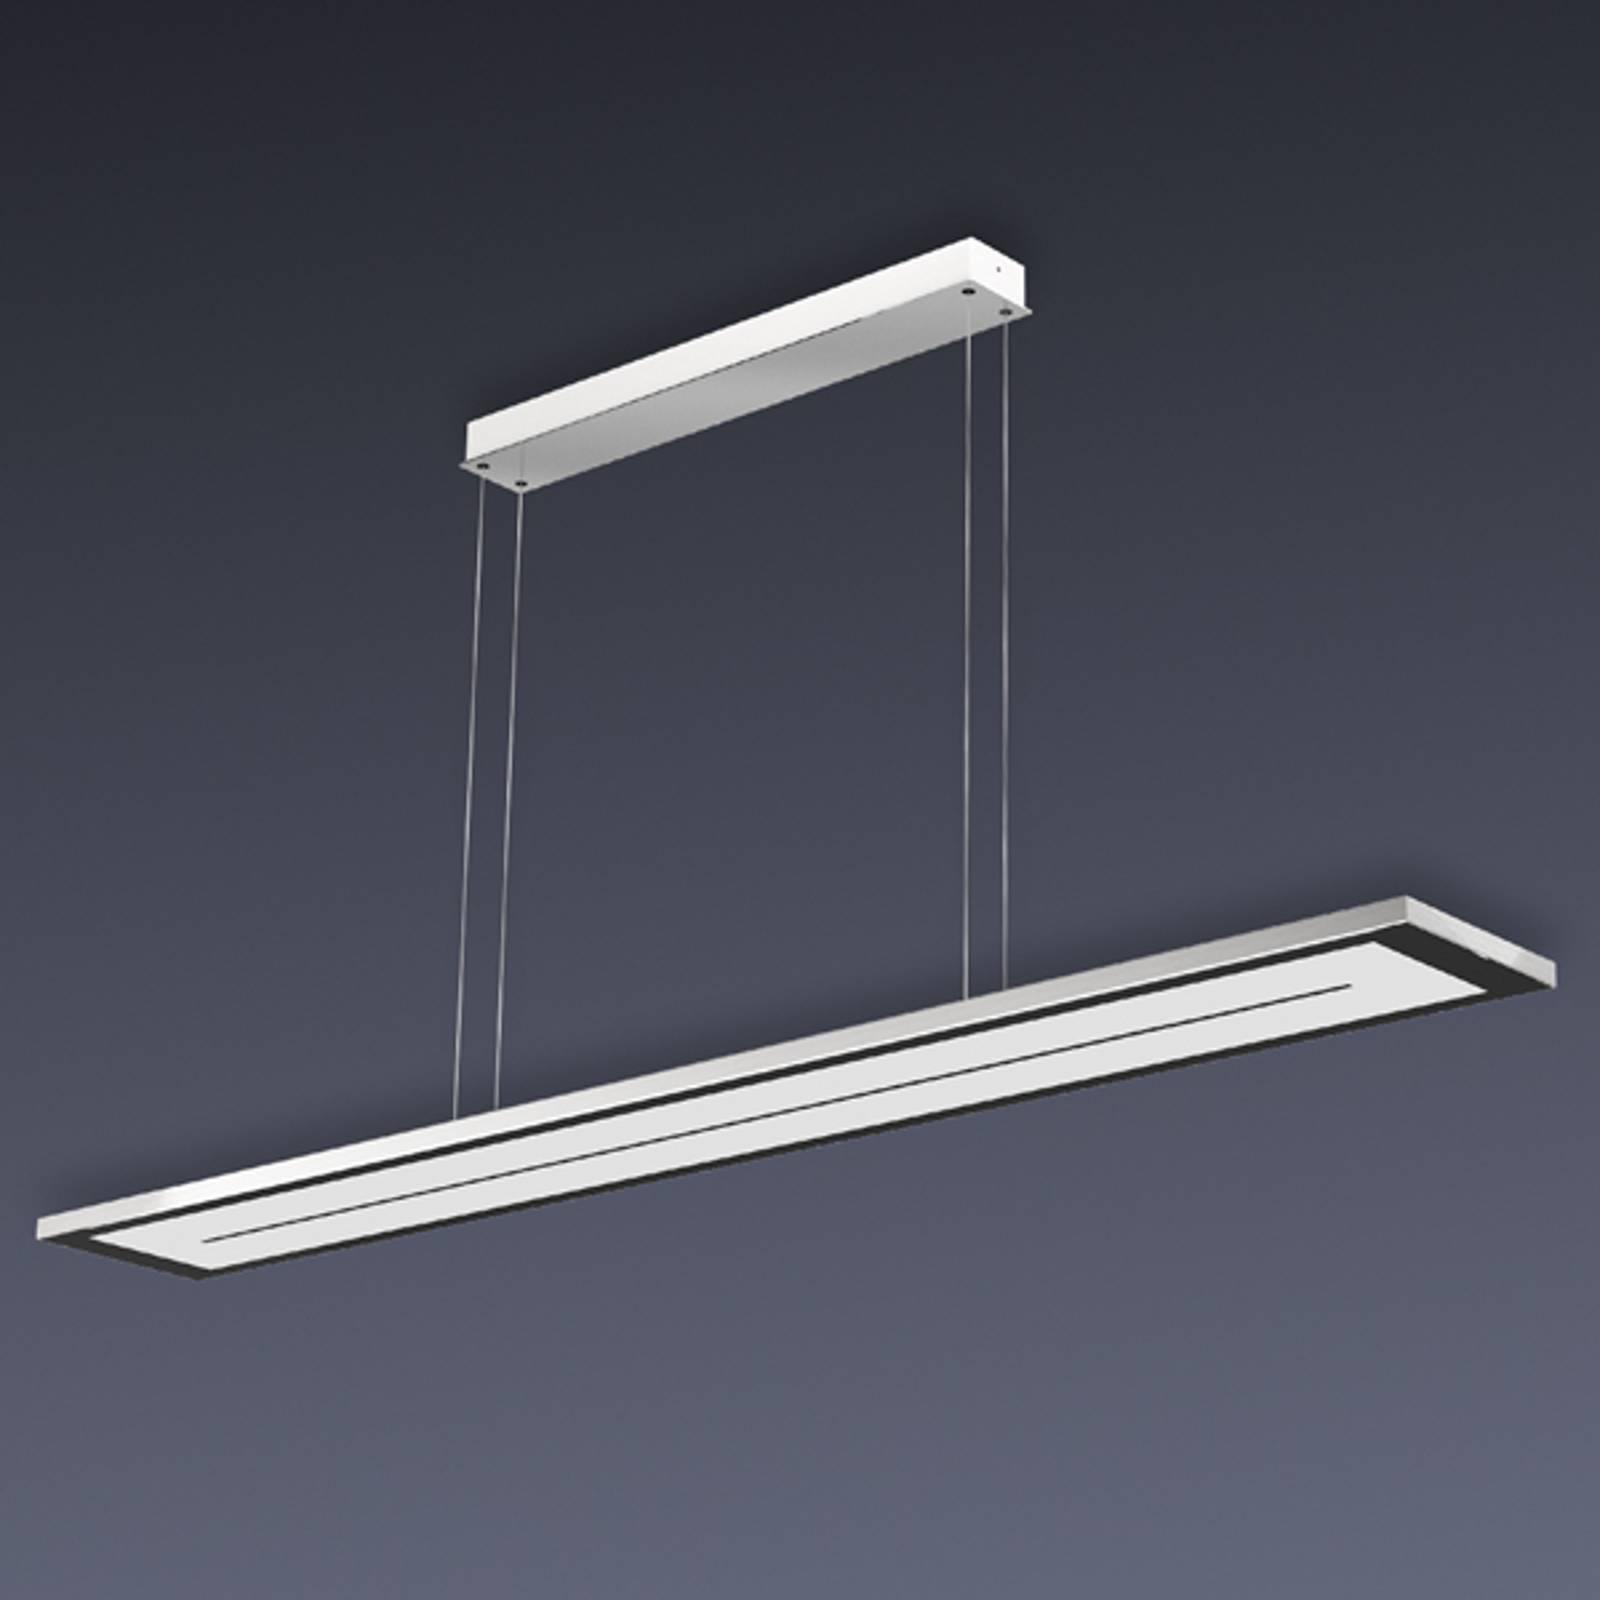 LED-pendellamp Zen - 138 cm lang